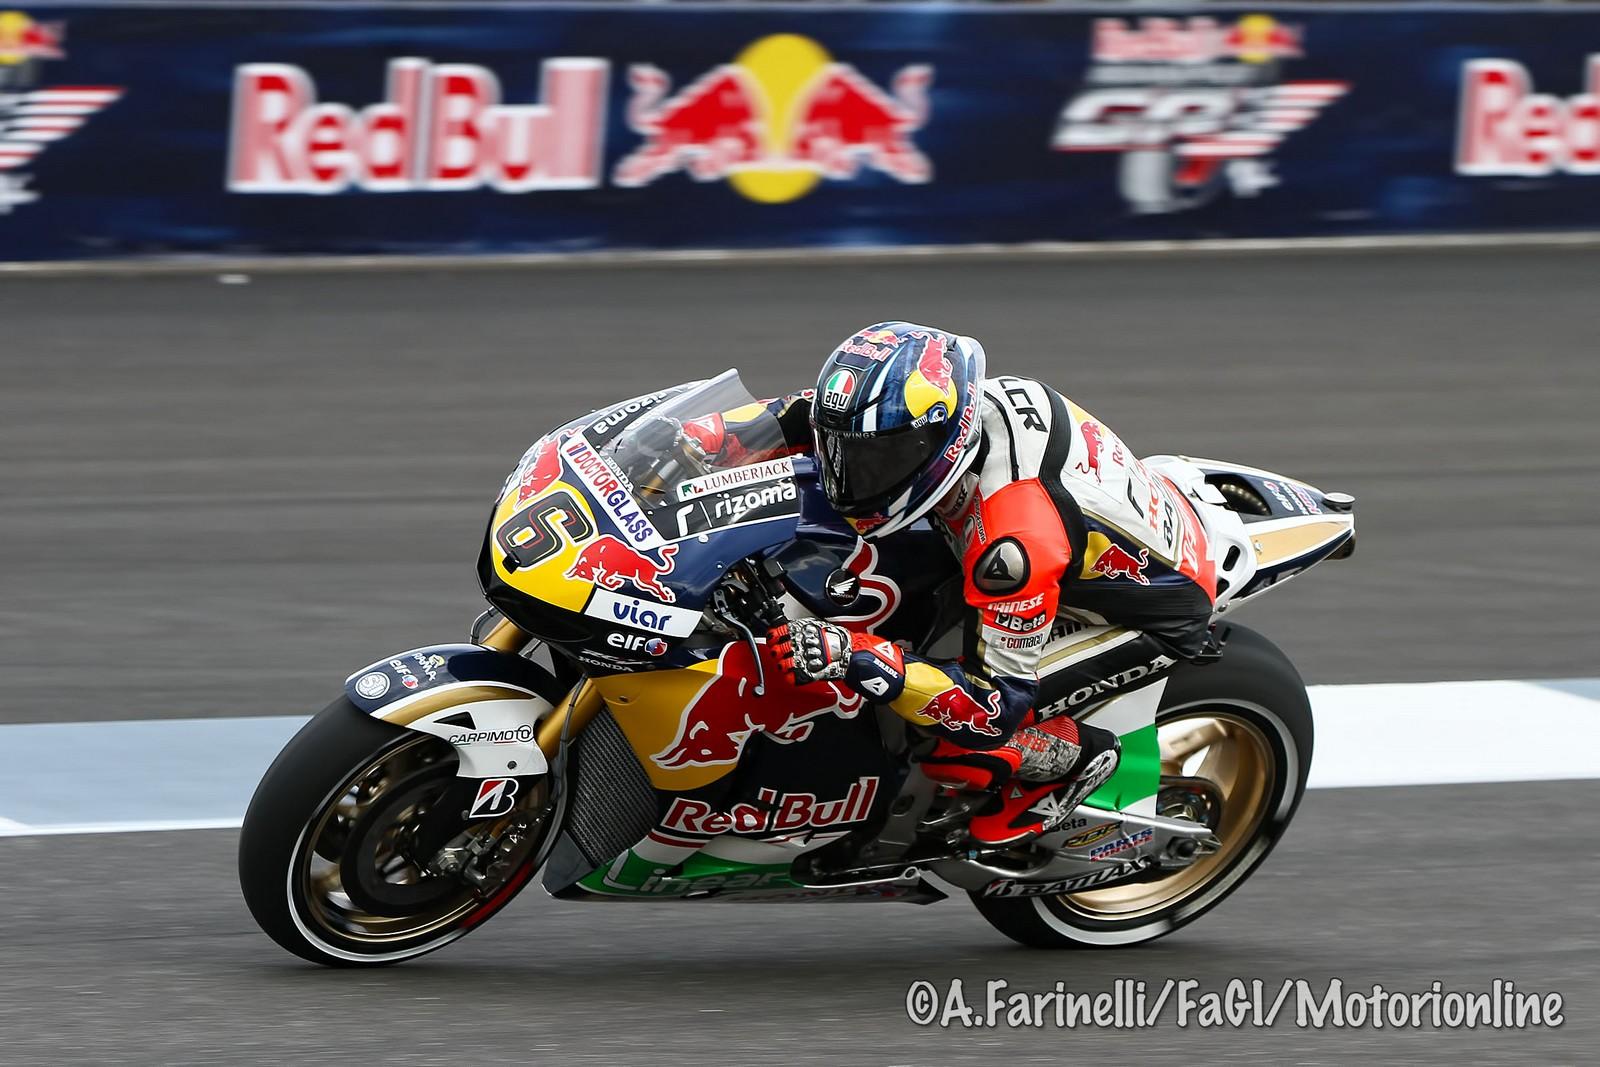 2013 Motogp | MotoGP 2017 Info, Video, Points Table